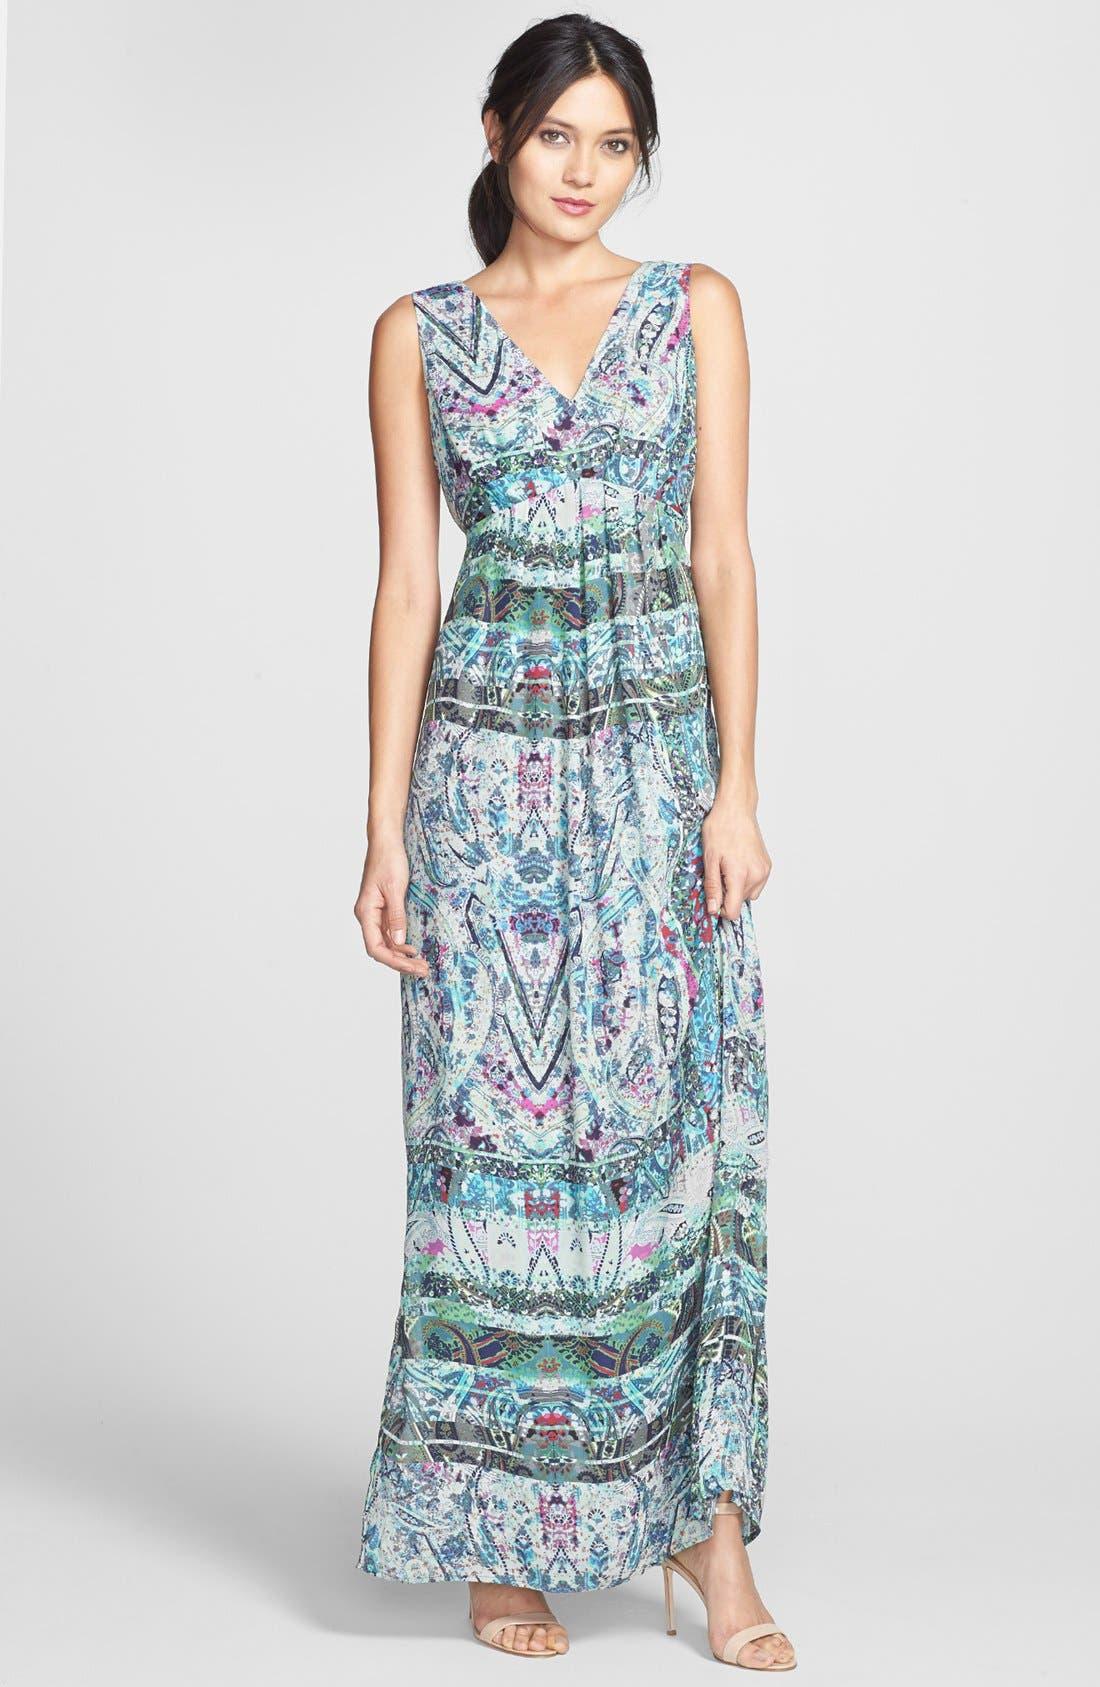 Main Image - Presley Skye Print Woven Maxi Dress